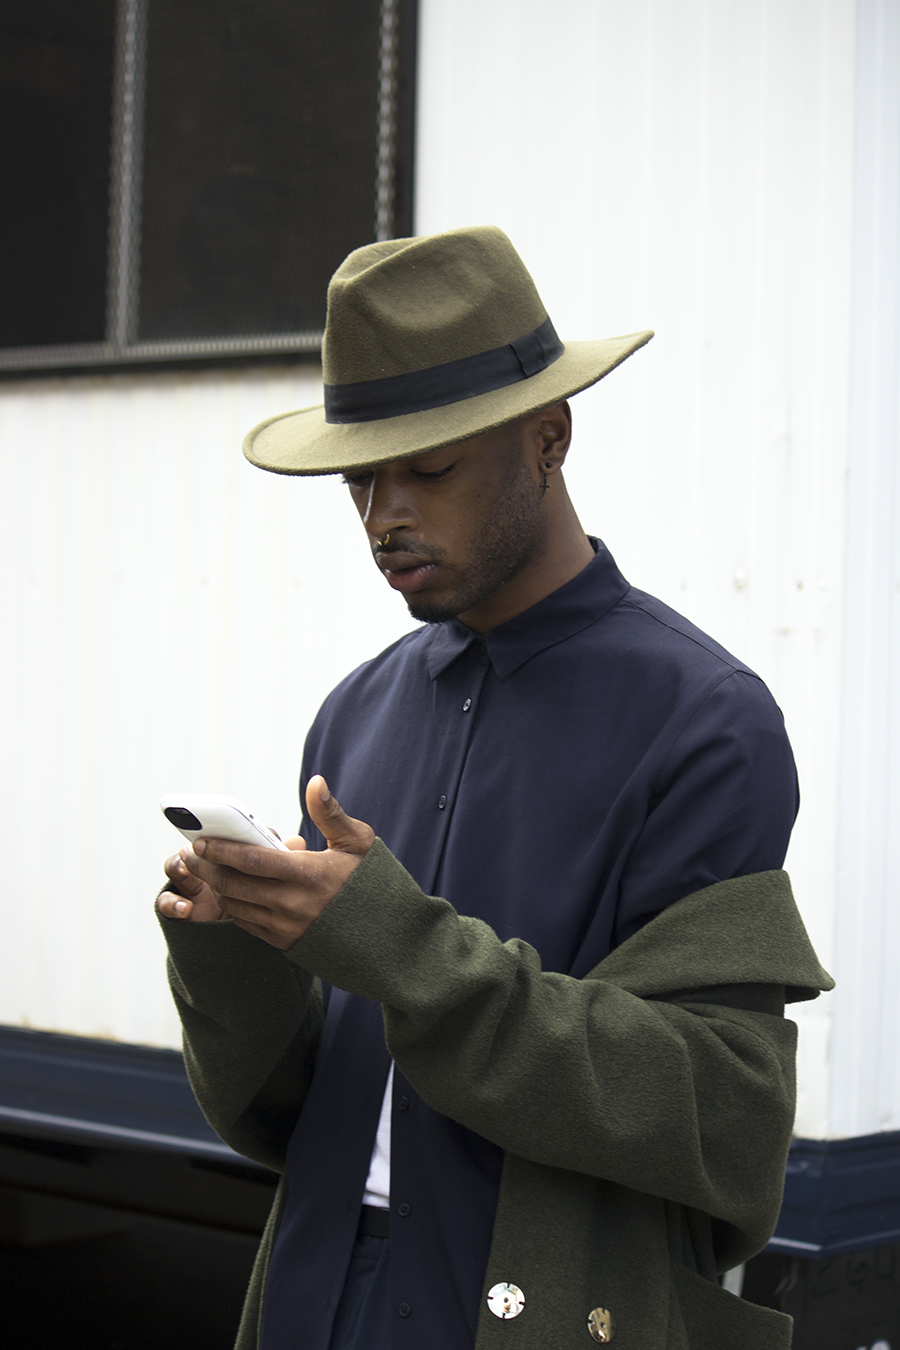 Sharon_Song_New_york_fashion_week_hat_wearing_male_black_fashionista_Tony_Ward_Studio